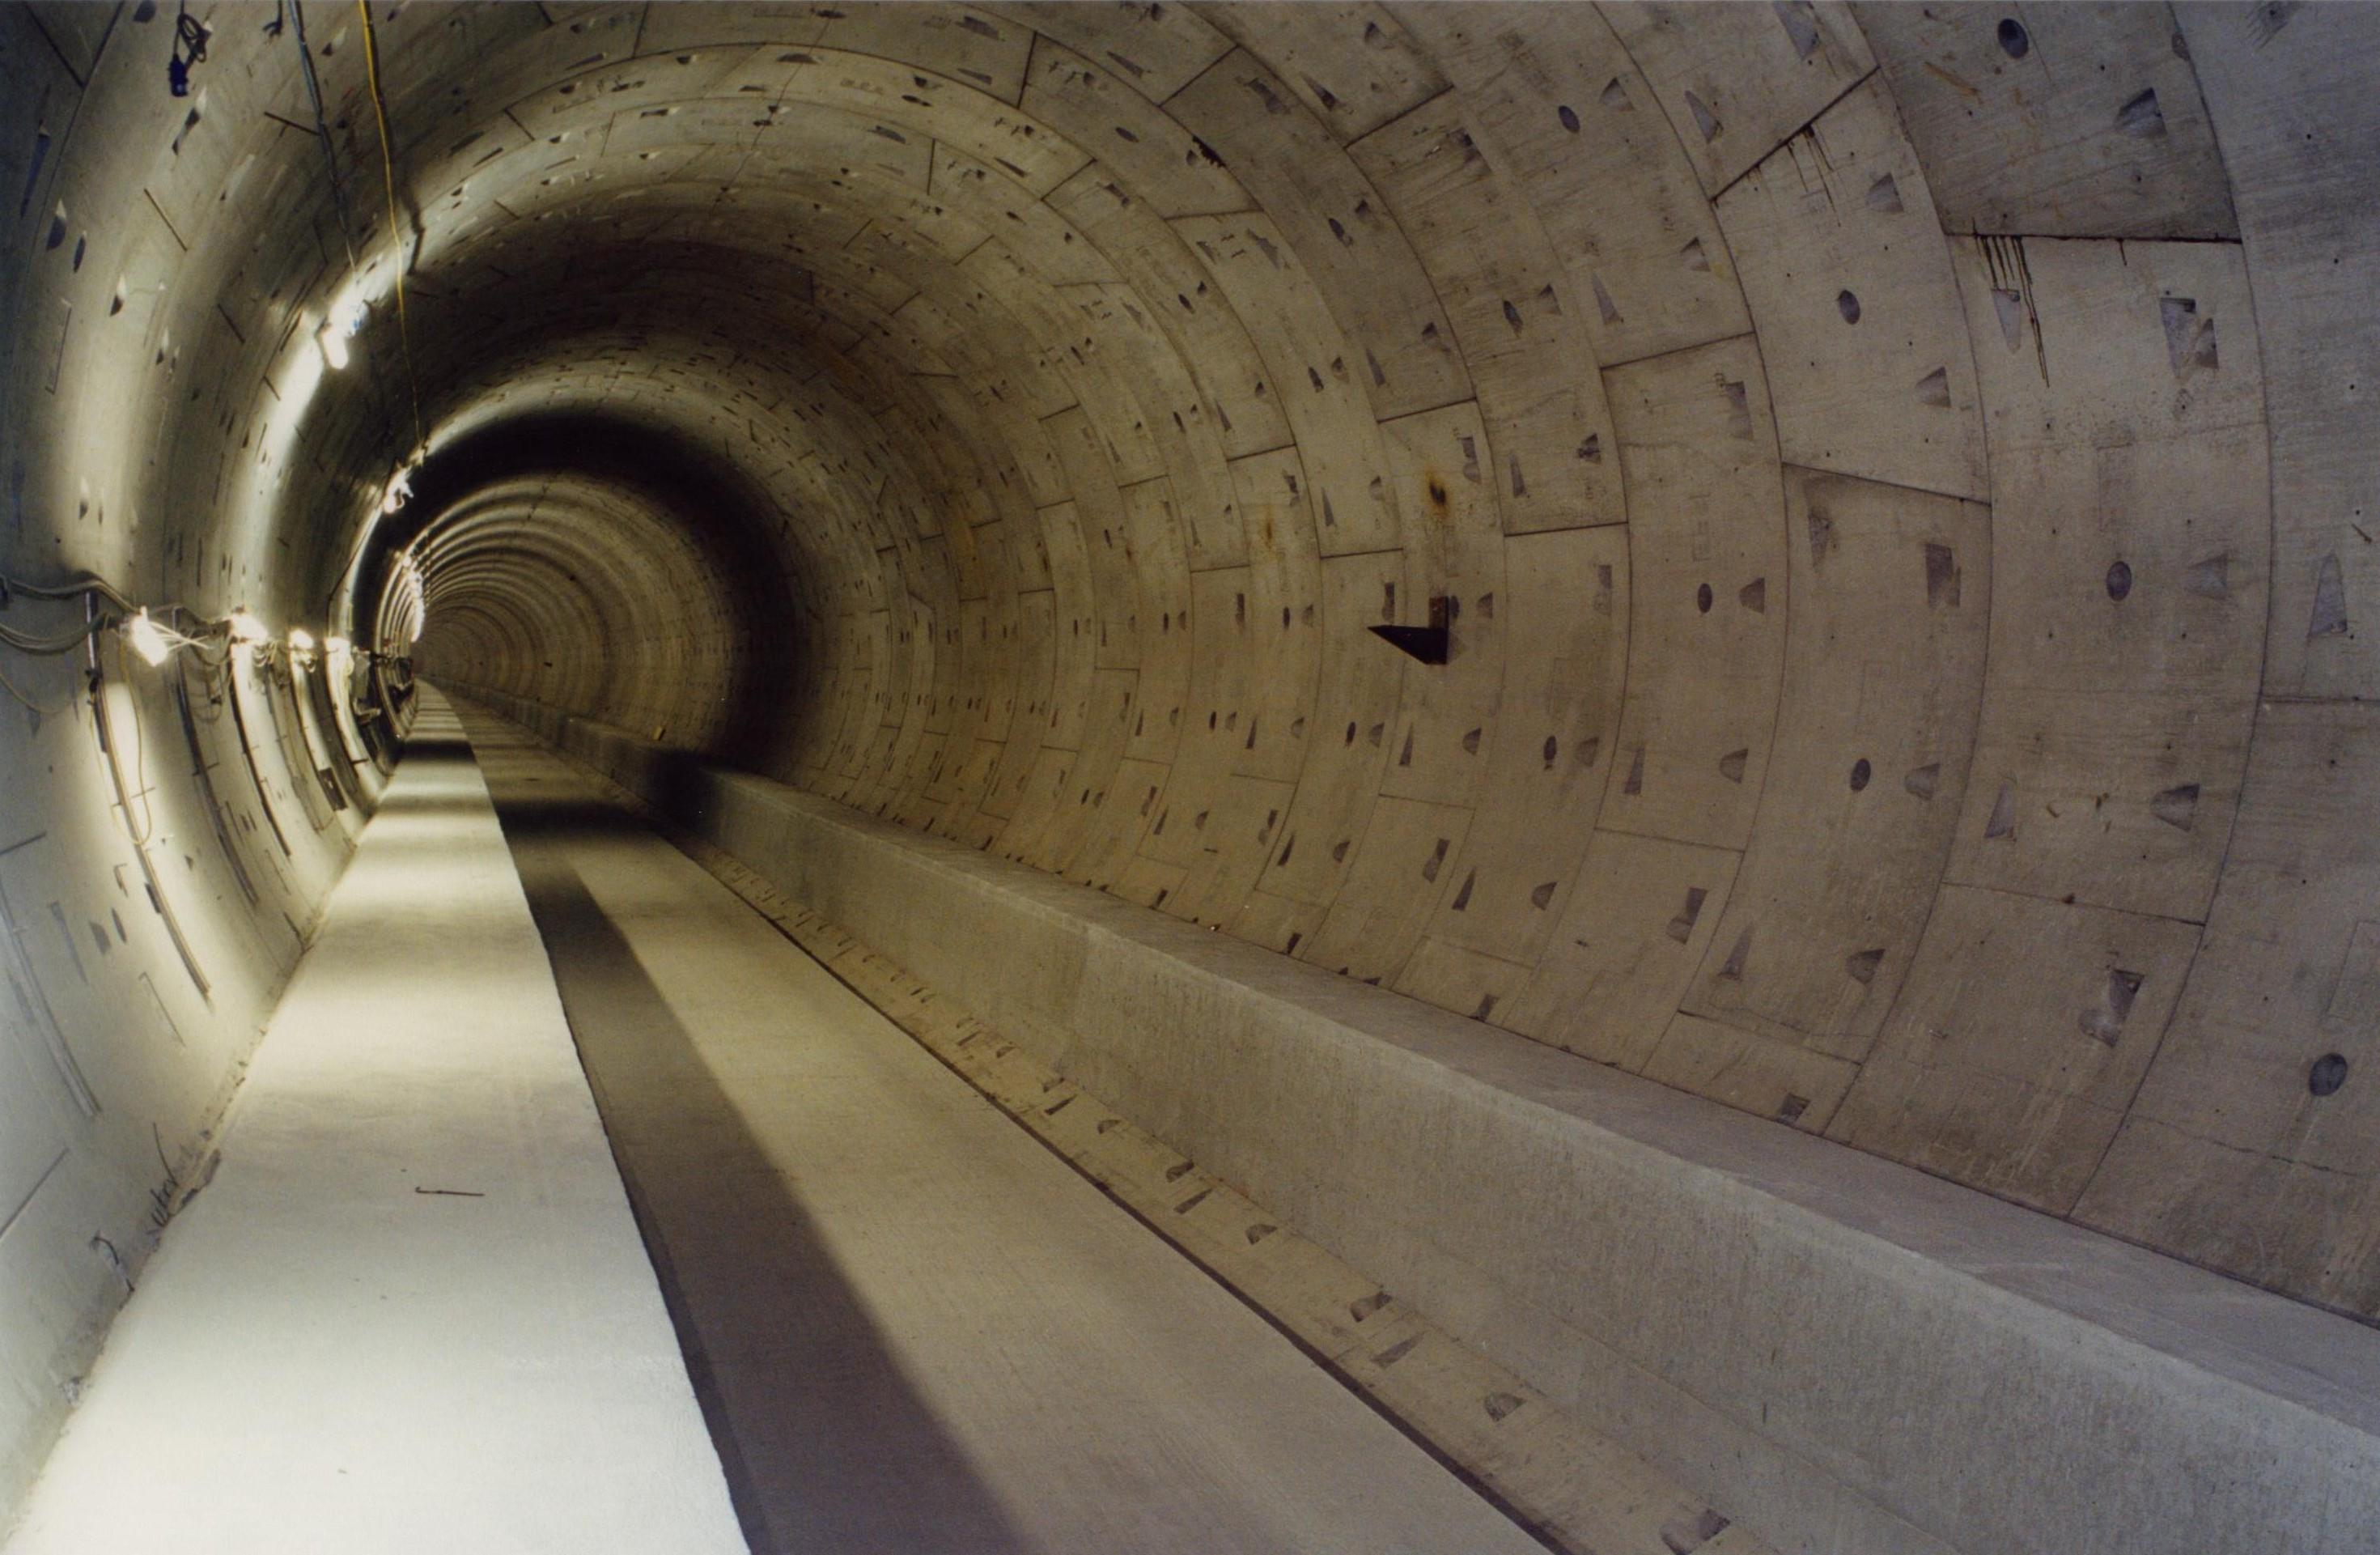 Channel Tunnel Rail Link C240 - London Bridge Associates